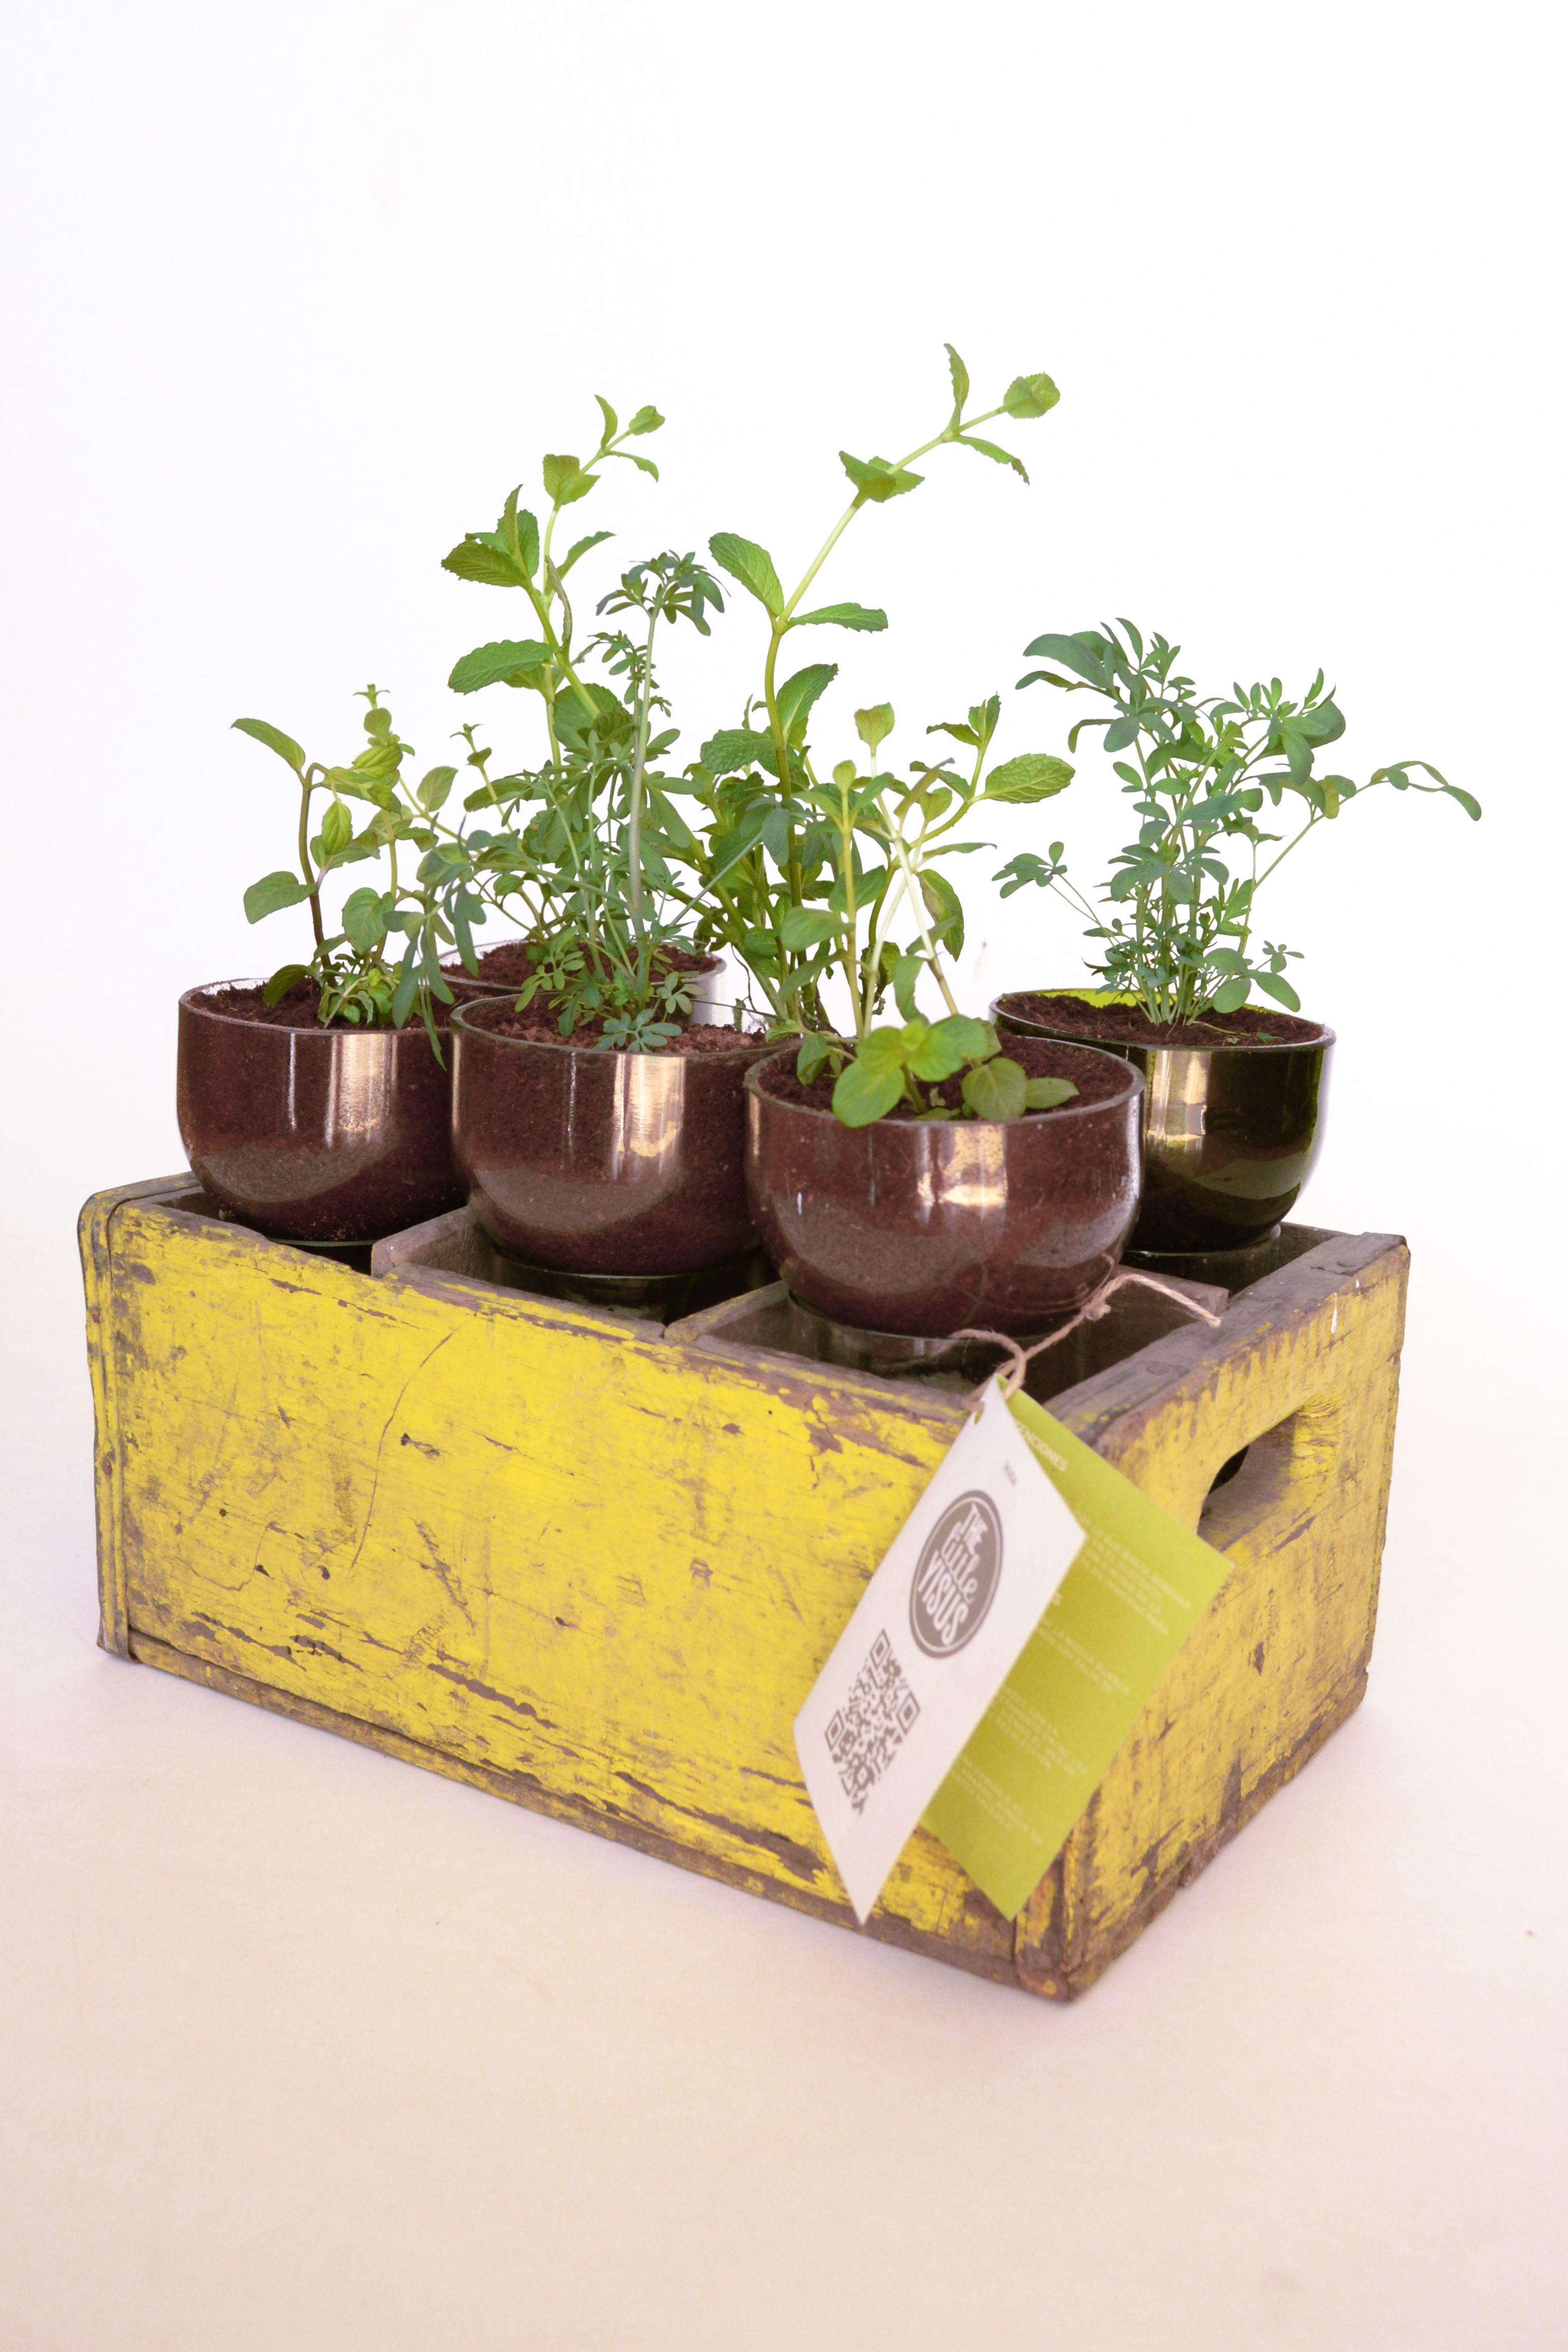 Regalo ecol gico plantas en botellas dise o ecol gico for Plantas ornamentales de interior